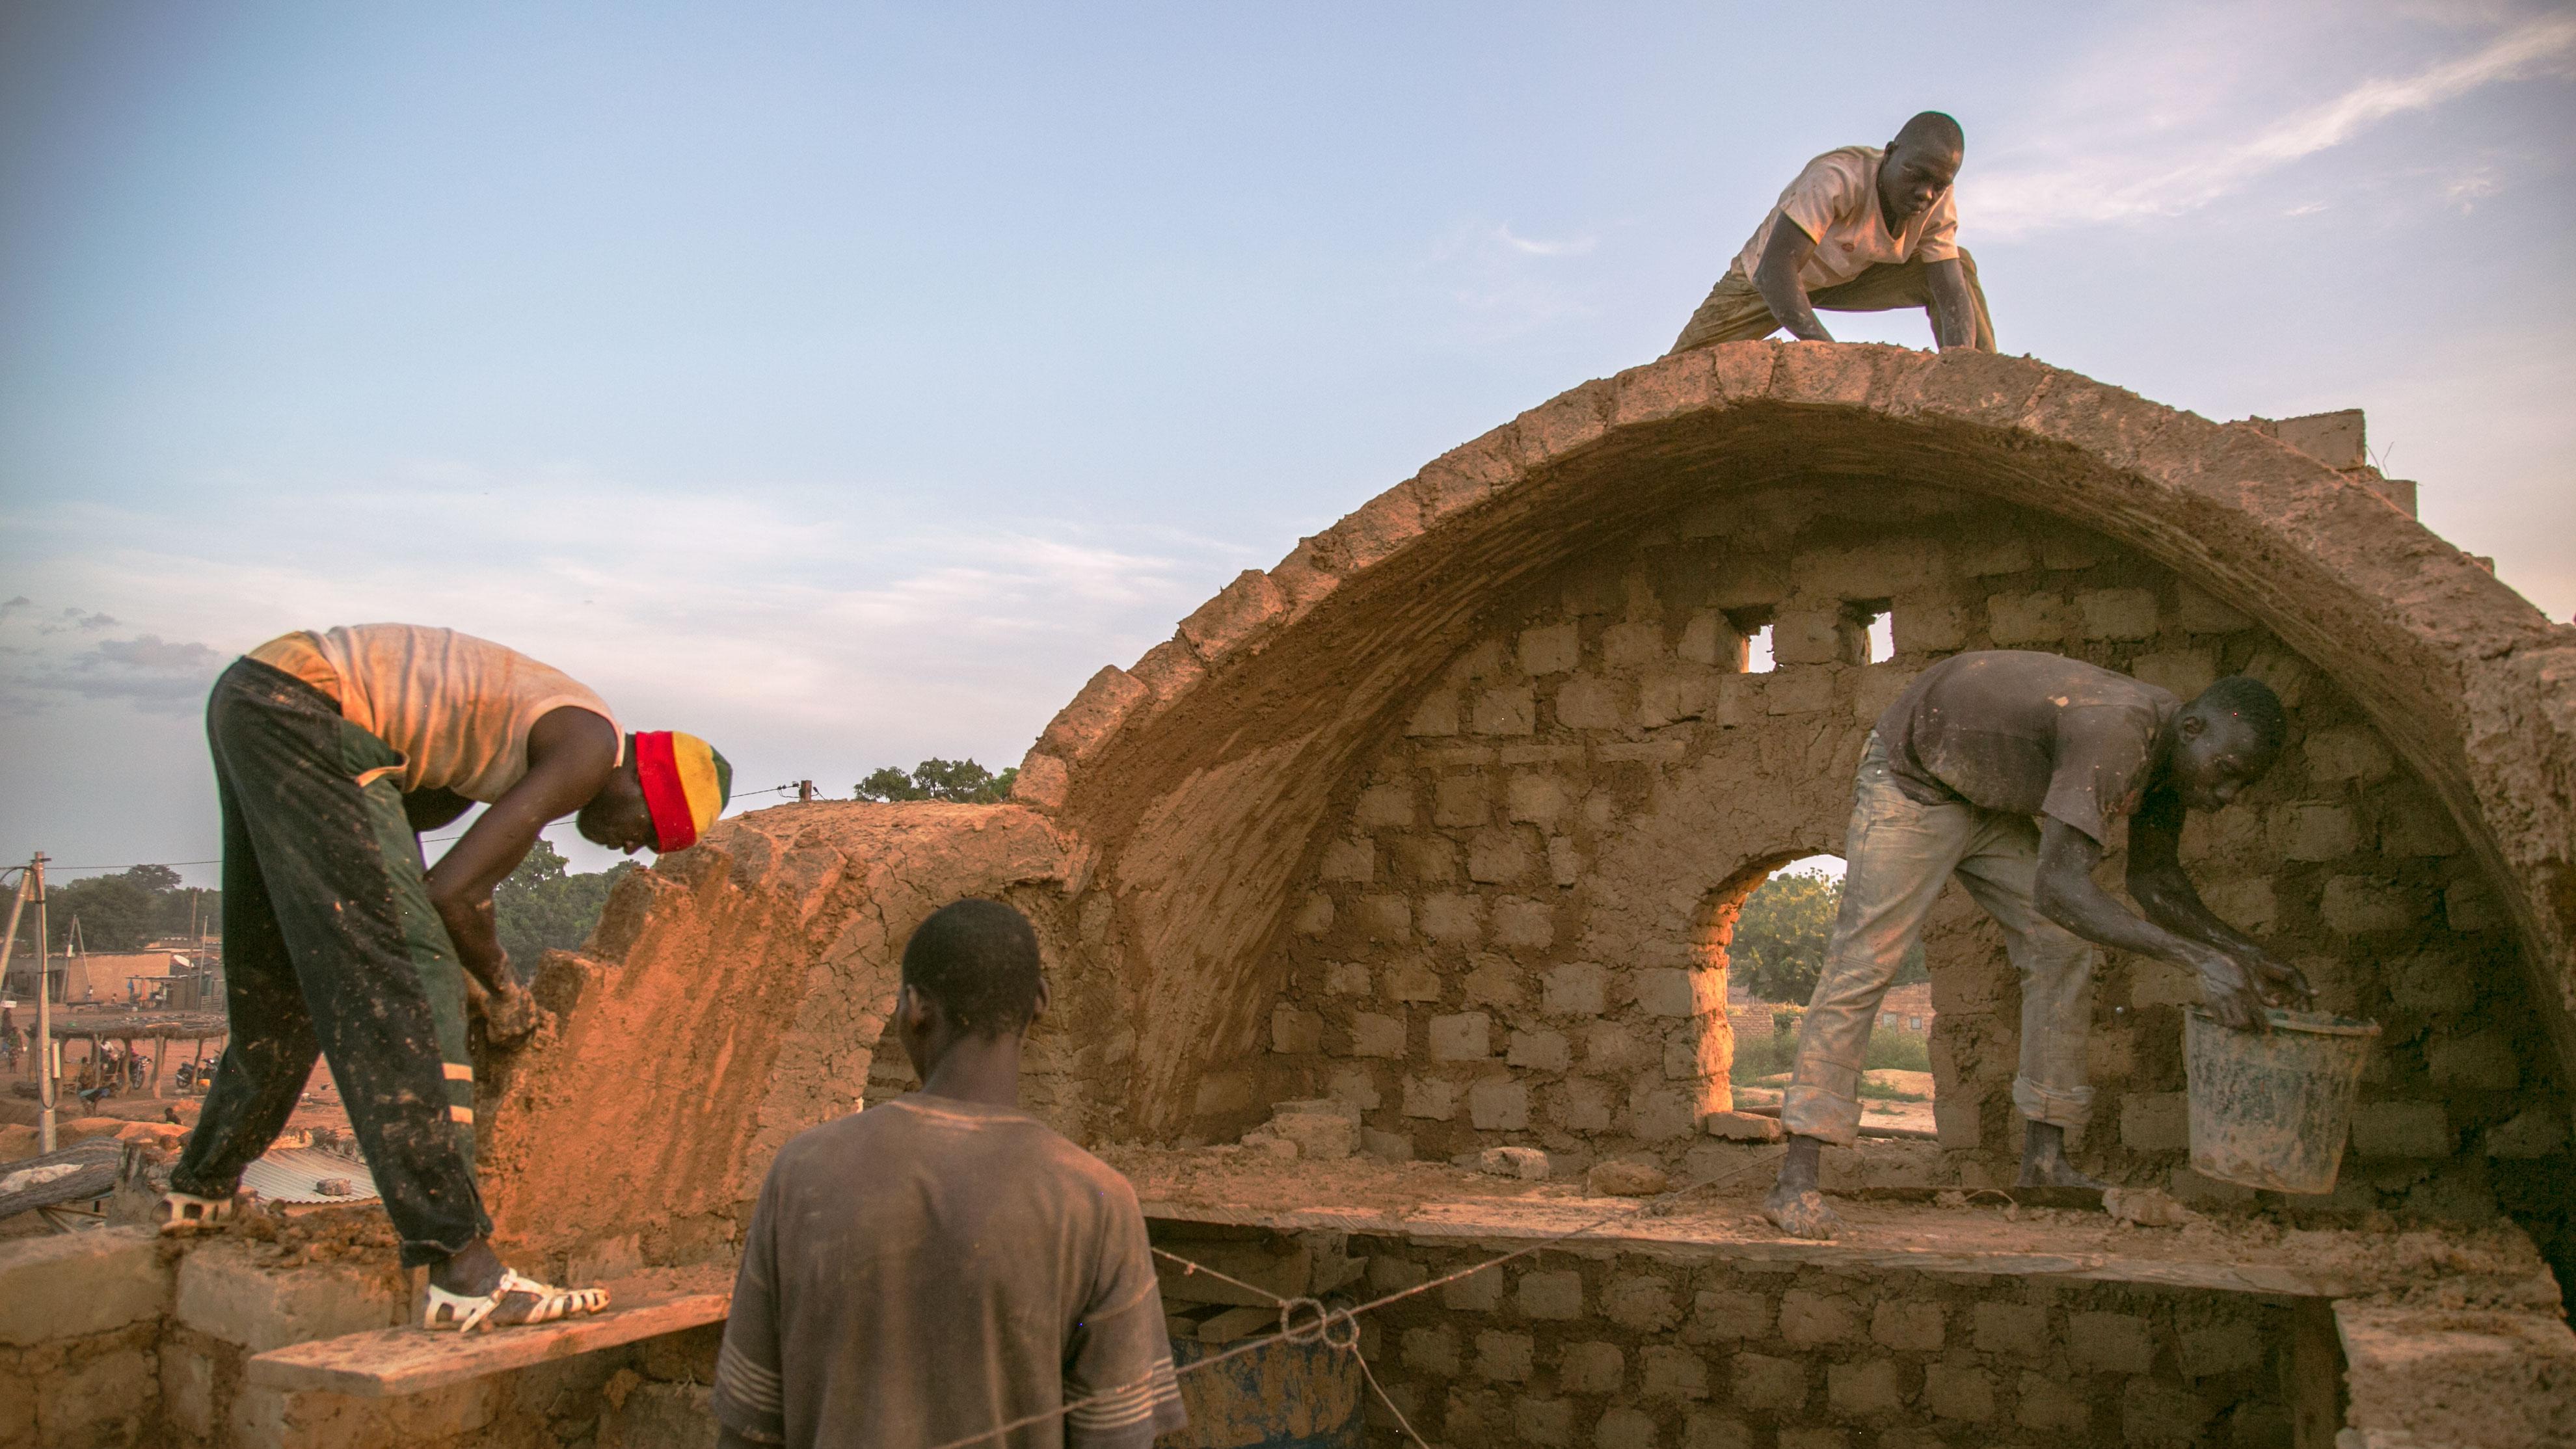 Building_a_house_-_Earth_Roofs_in_the_Sahel_Program.jpg